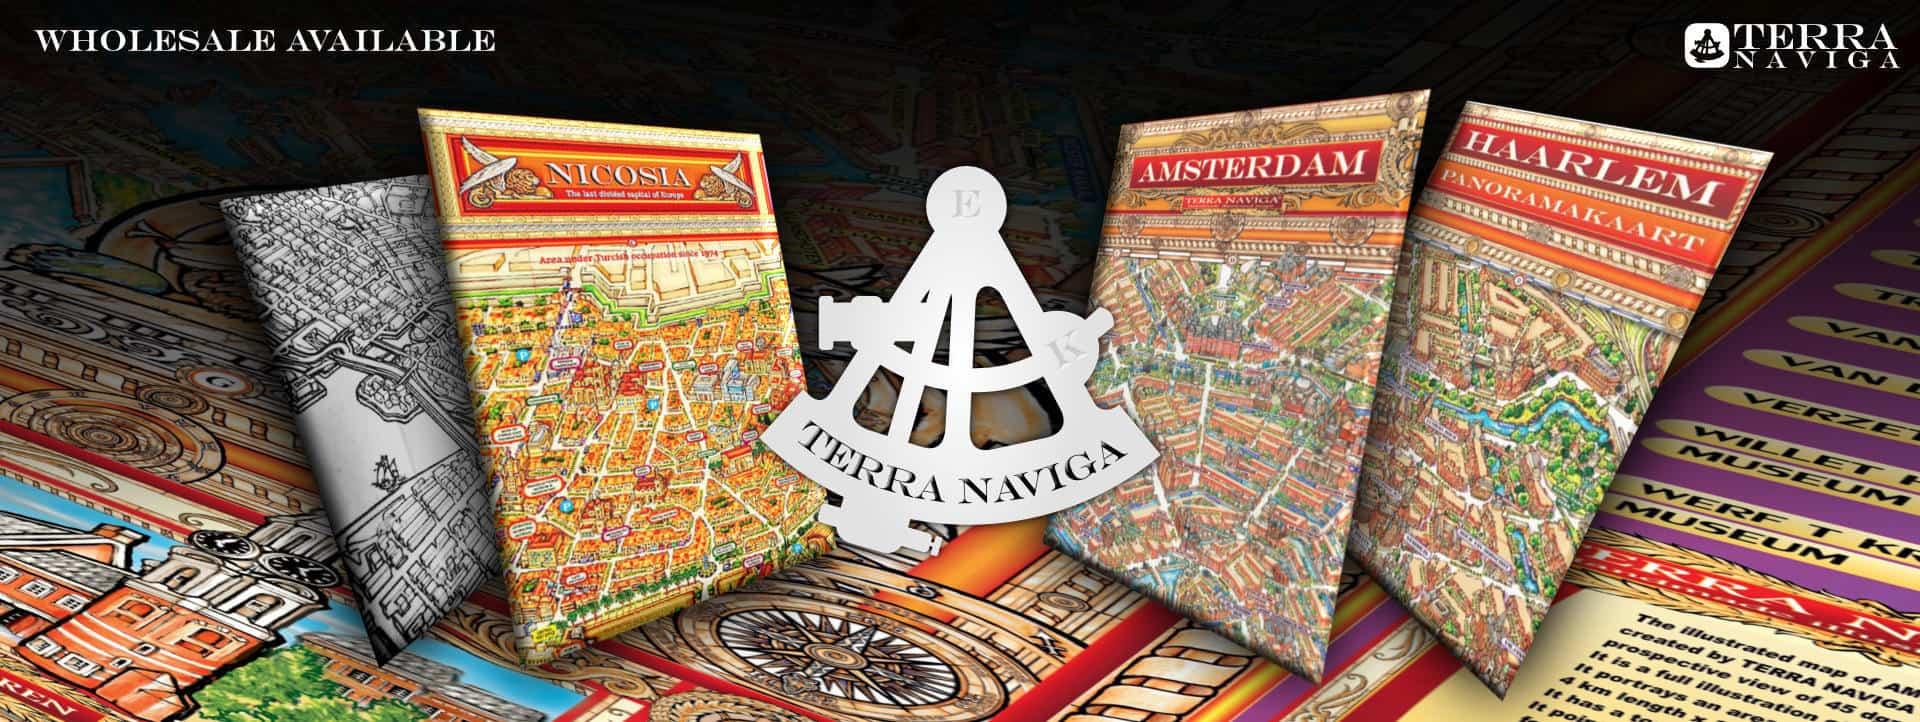 Terra Naviga Amsterdam Nicosia Map